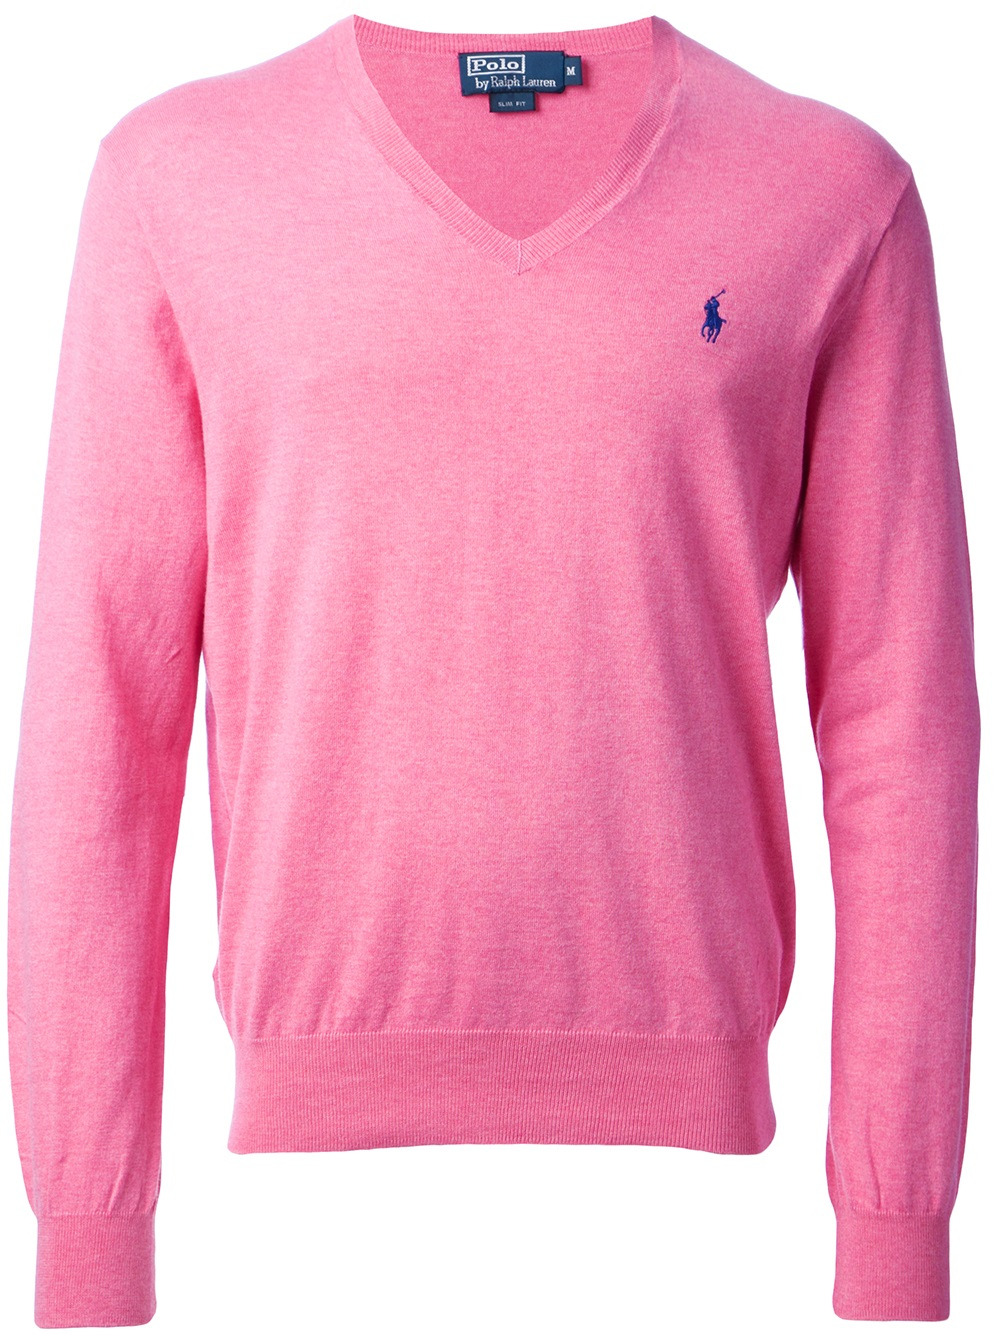 Lyst Polo Ralph Lauren Classic Sweater In Purple For Men